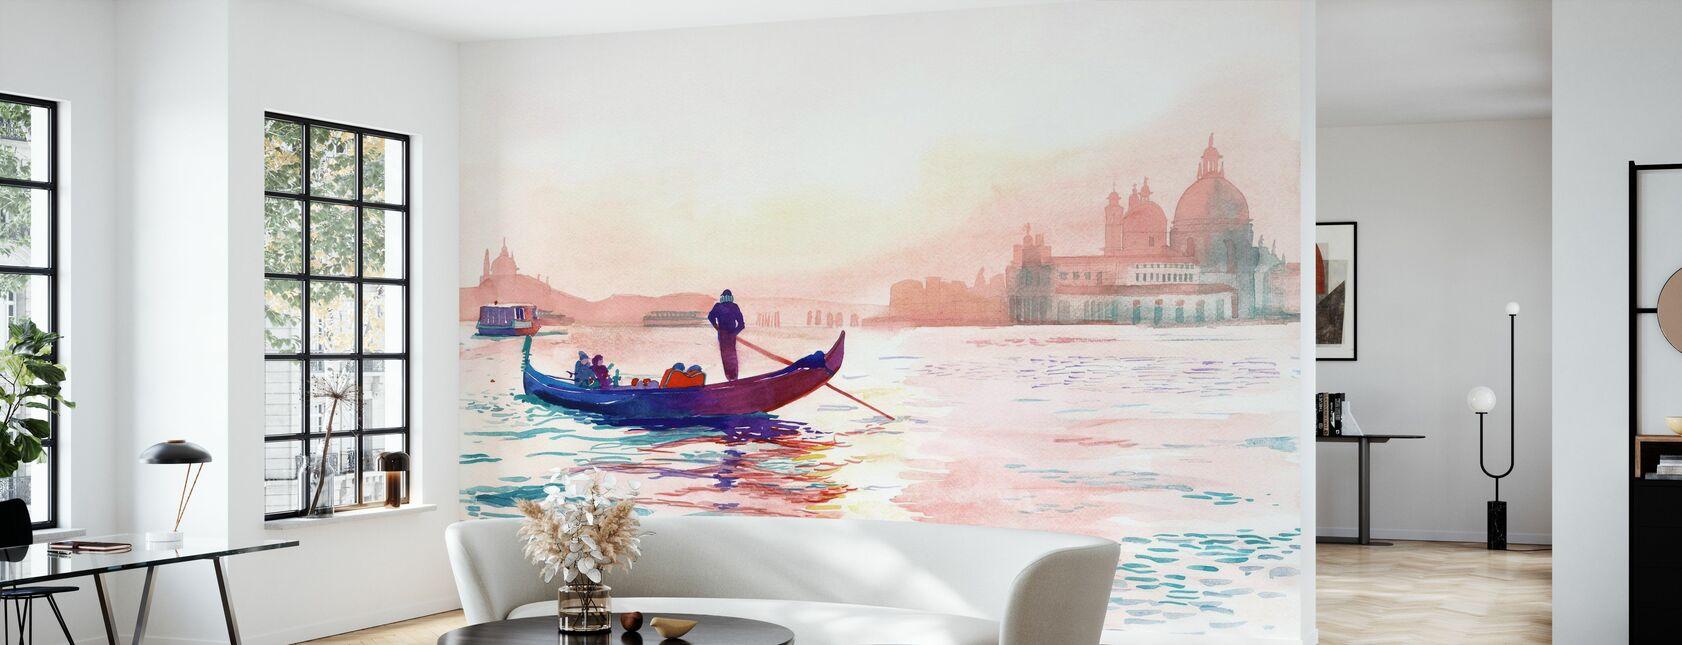 Grand Hotel Venedig - Tapet - Stue